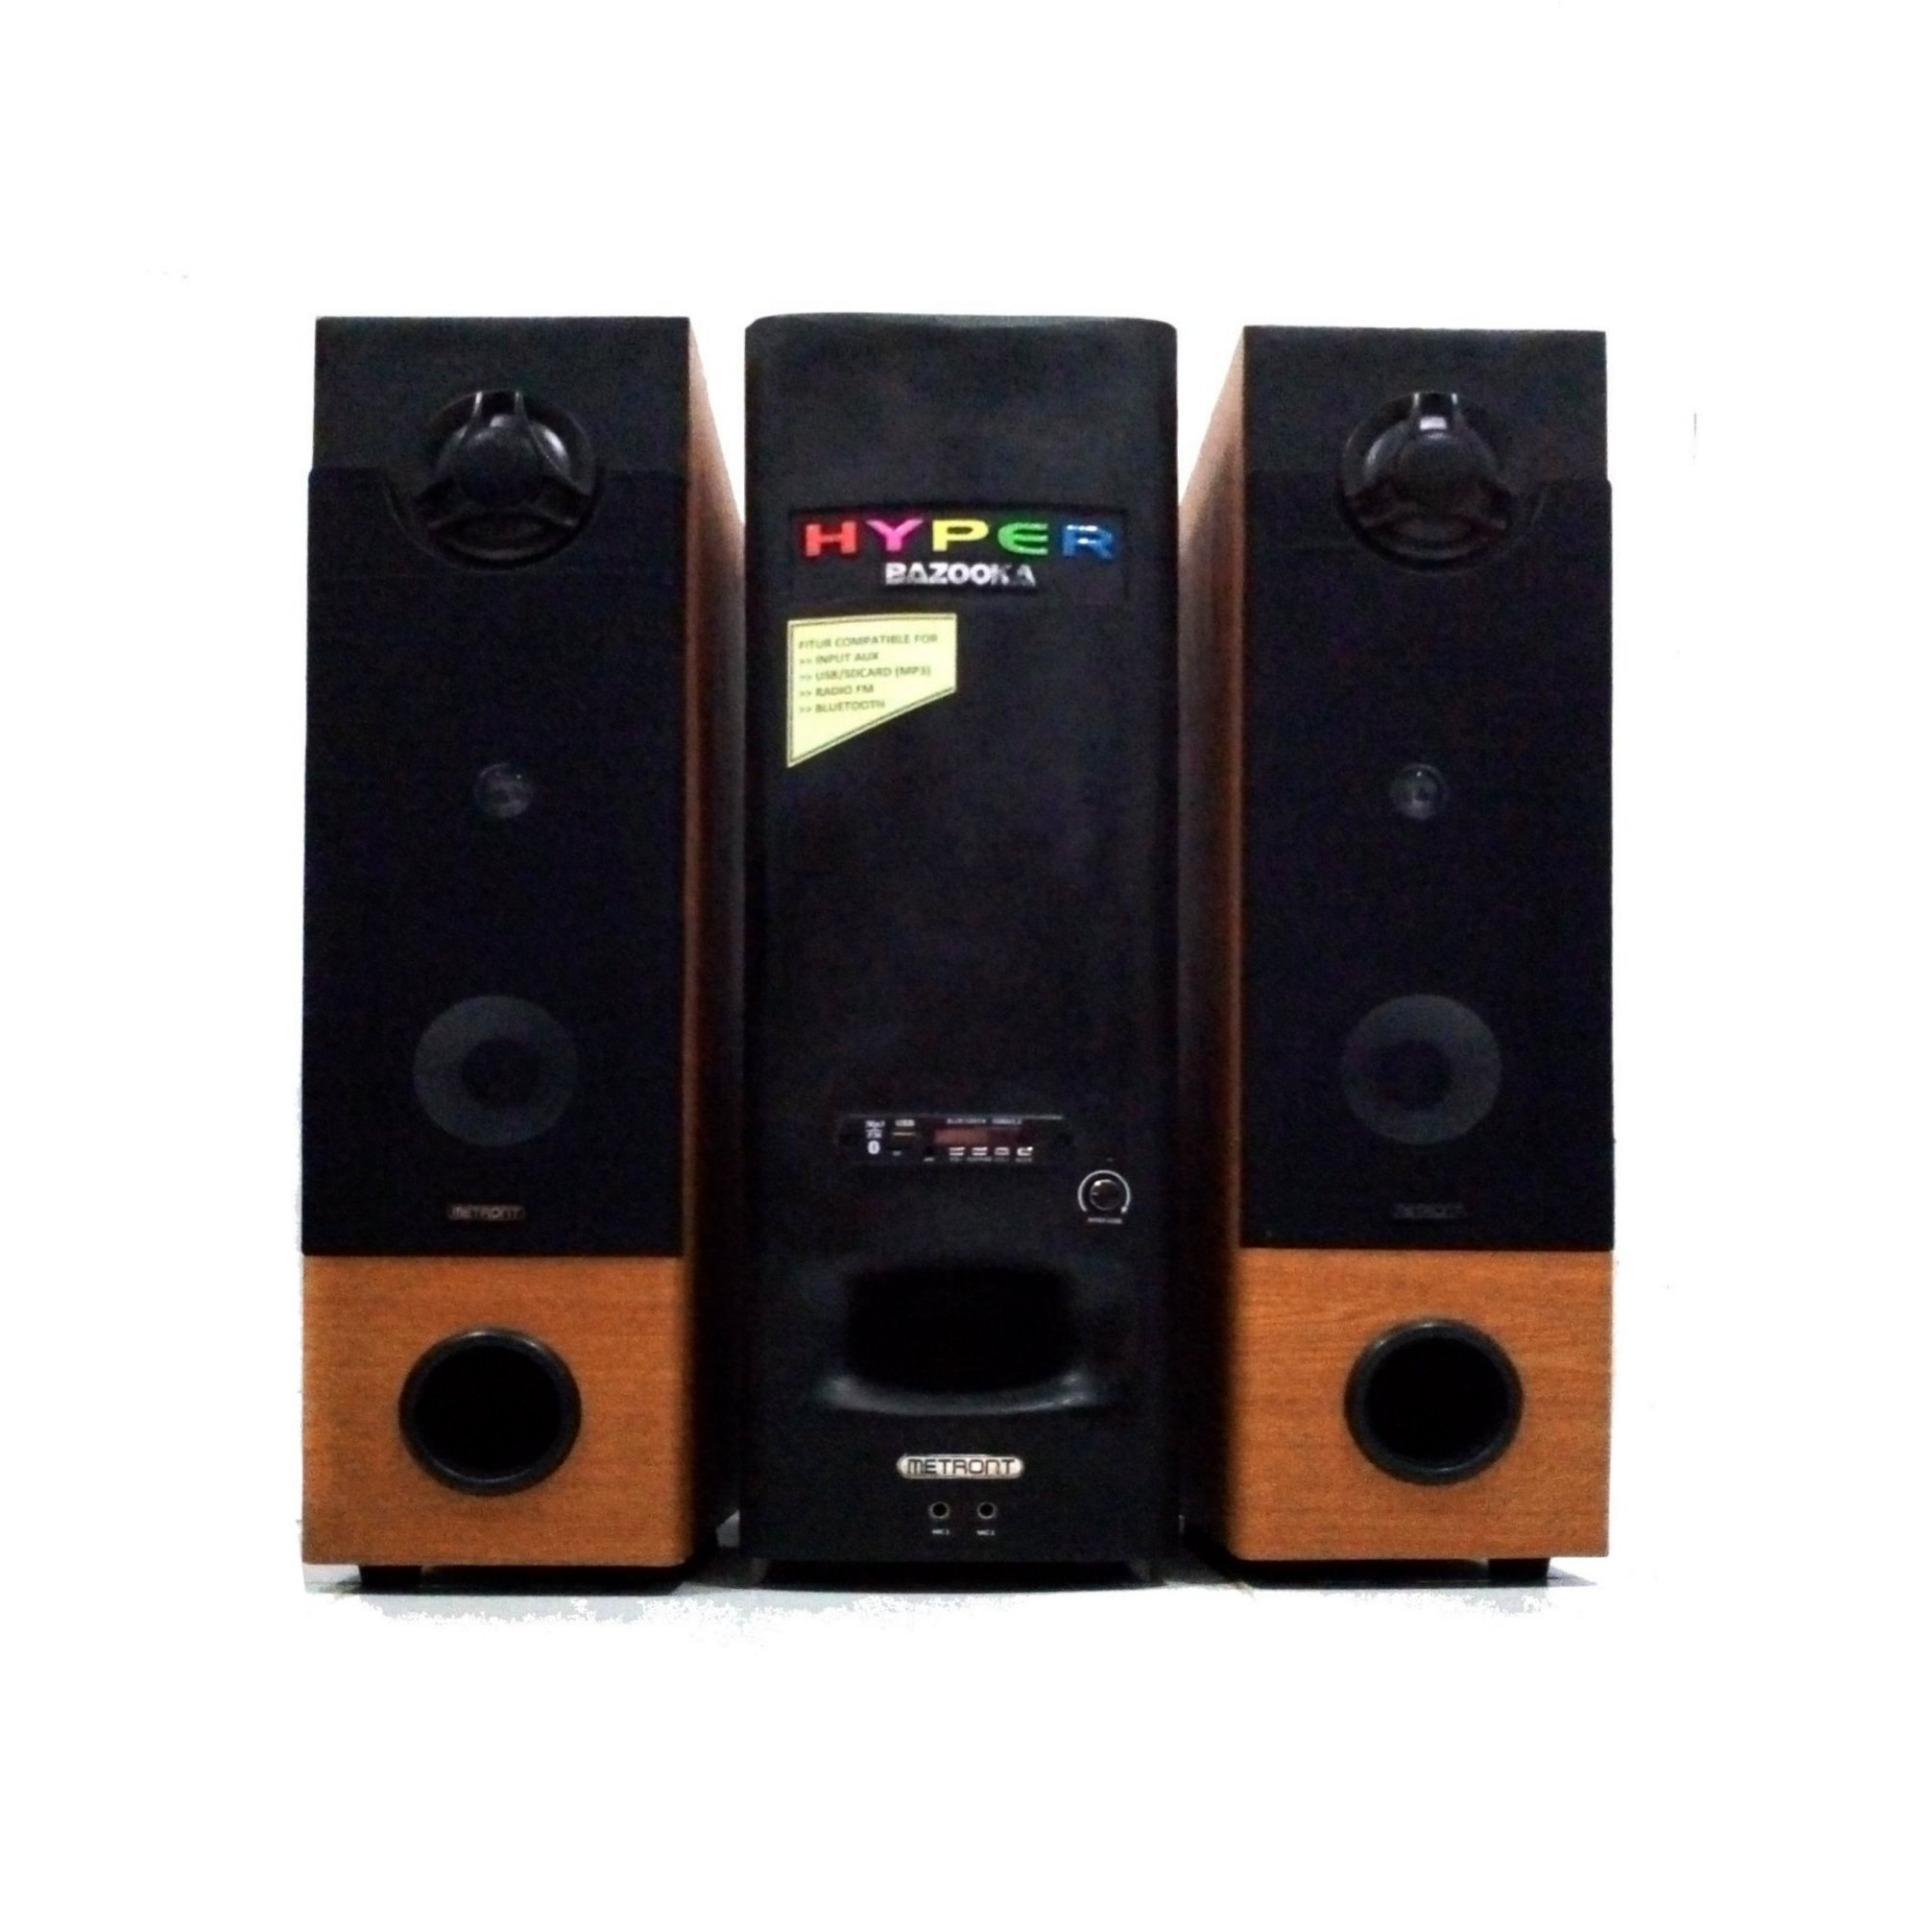 Speaker Bluetooth Subwoofer Full Band Hyper Bazooka 10000W - Orange Black